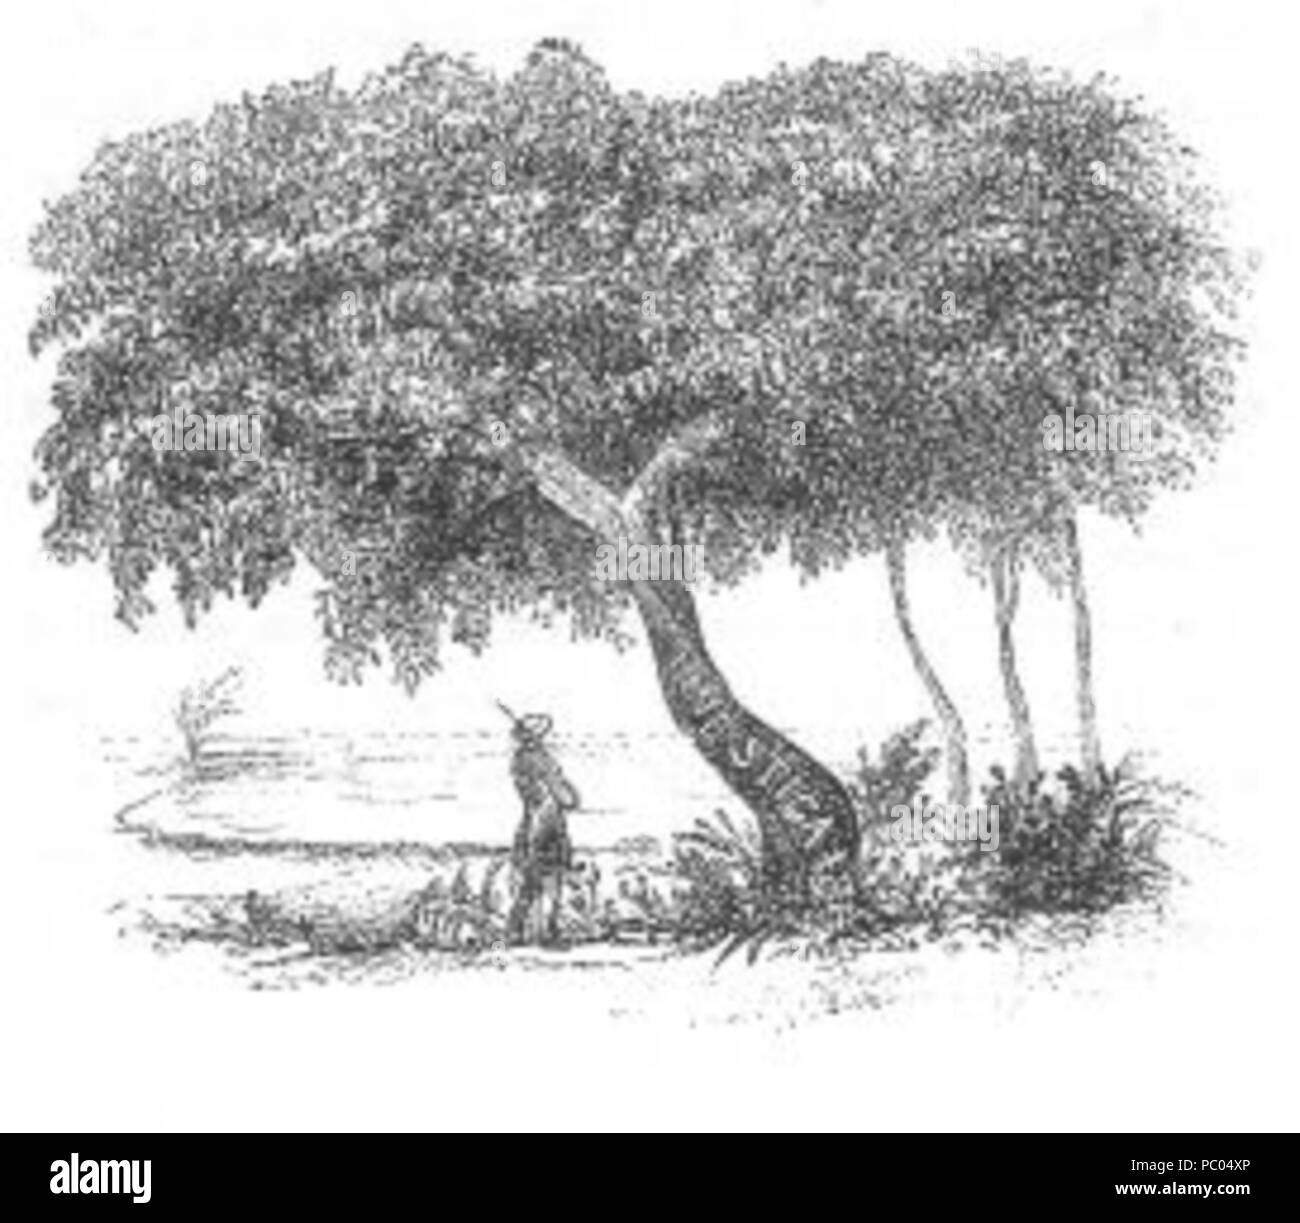 298 Interesting Tree (Discoveries in Australia) - Stock Image